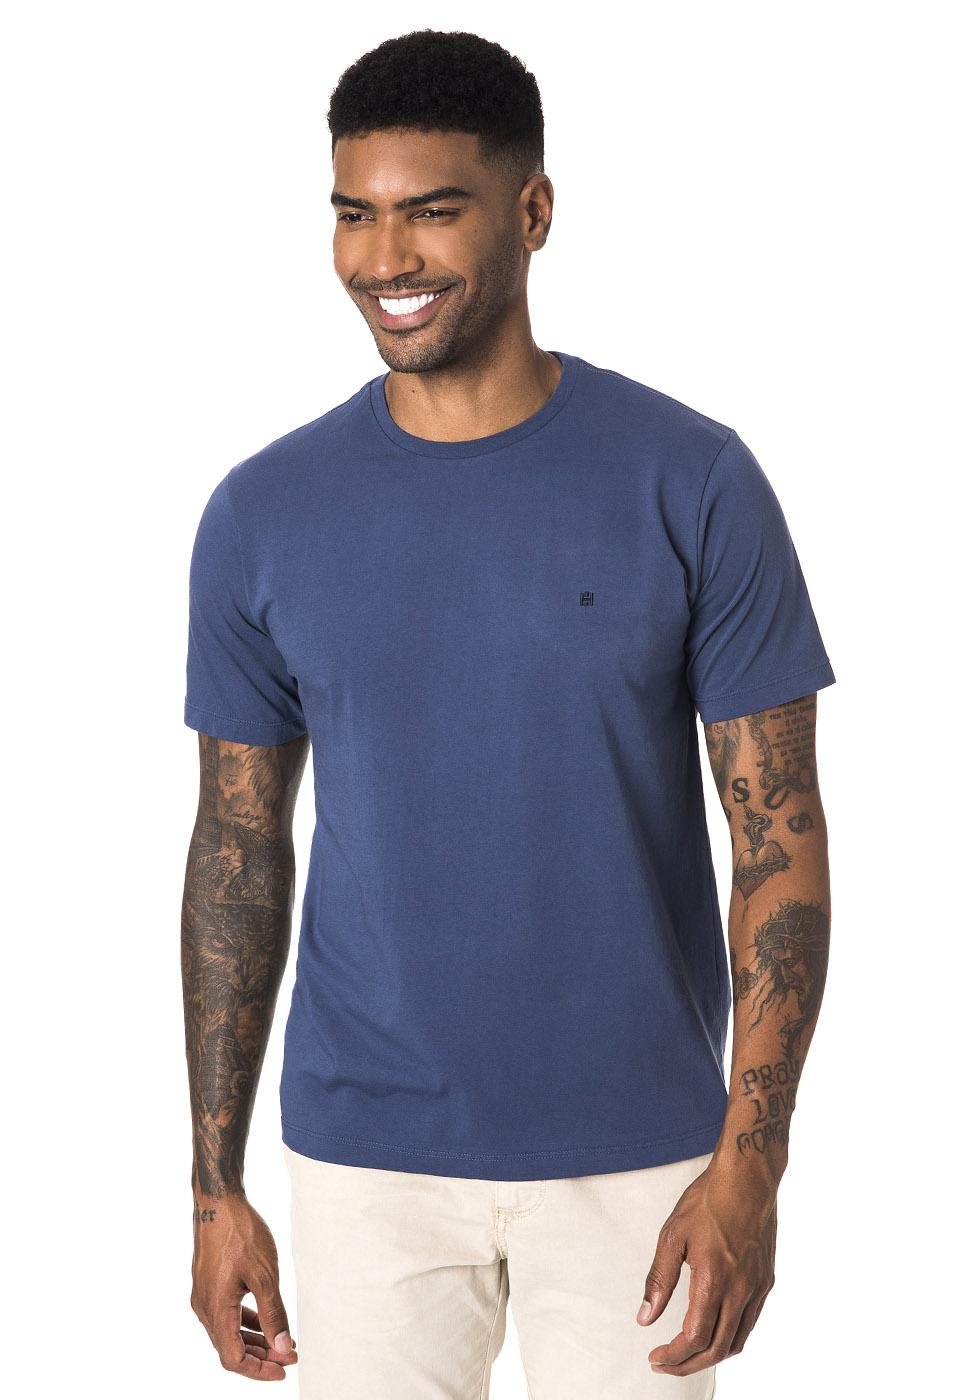 Camiseta T-shirt 100% algodão High Stil